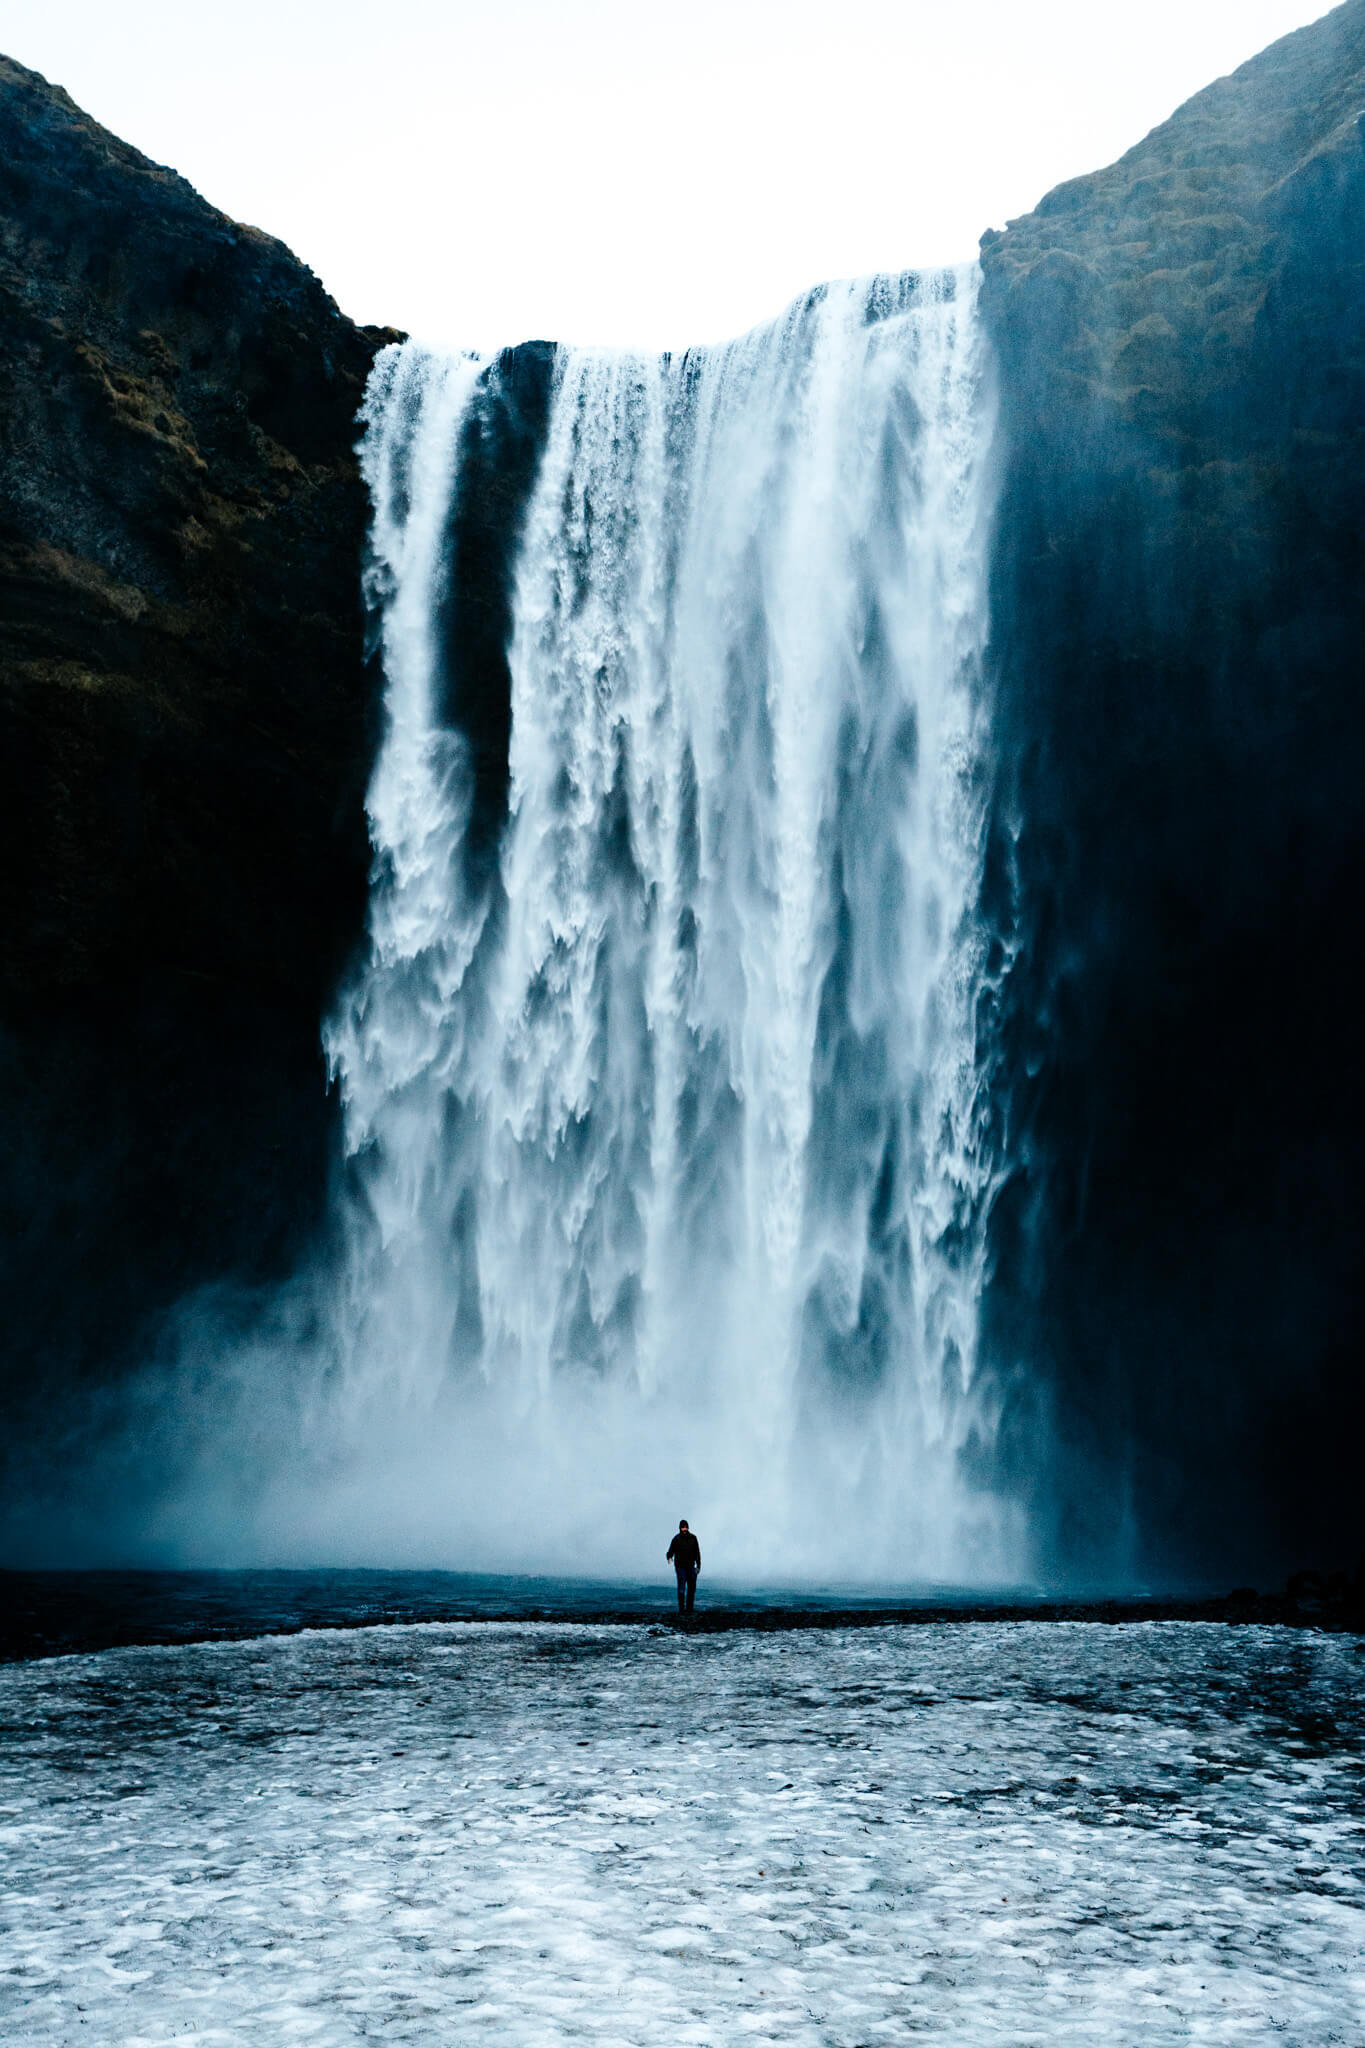 Iceland-Travel-Photography-Natalie-Skoric-5.jpg